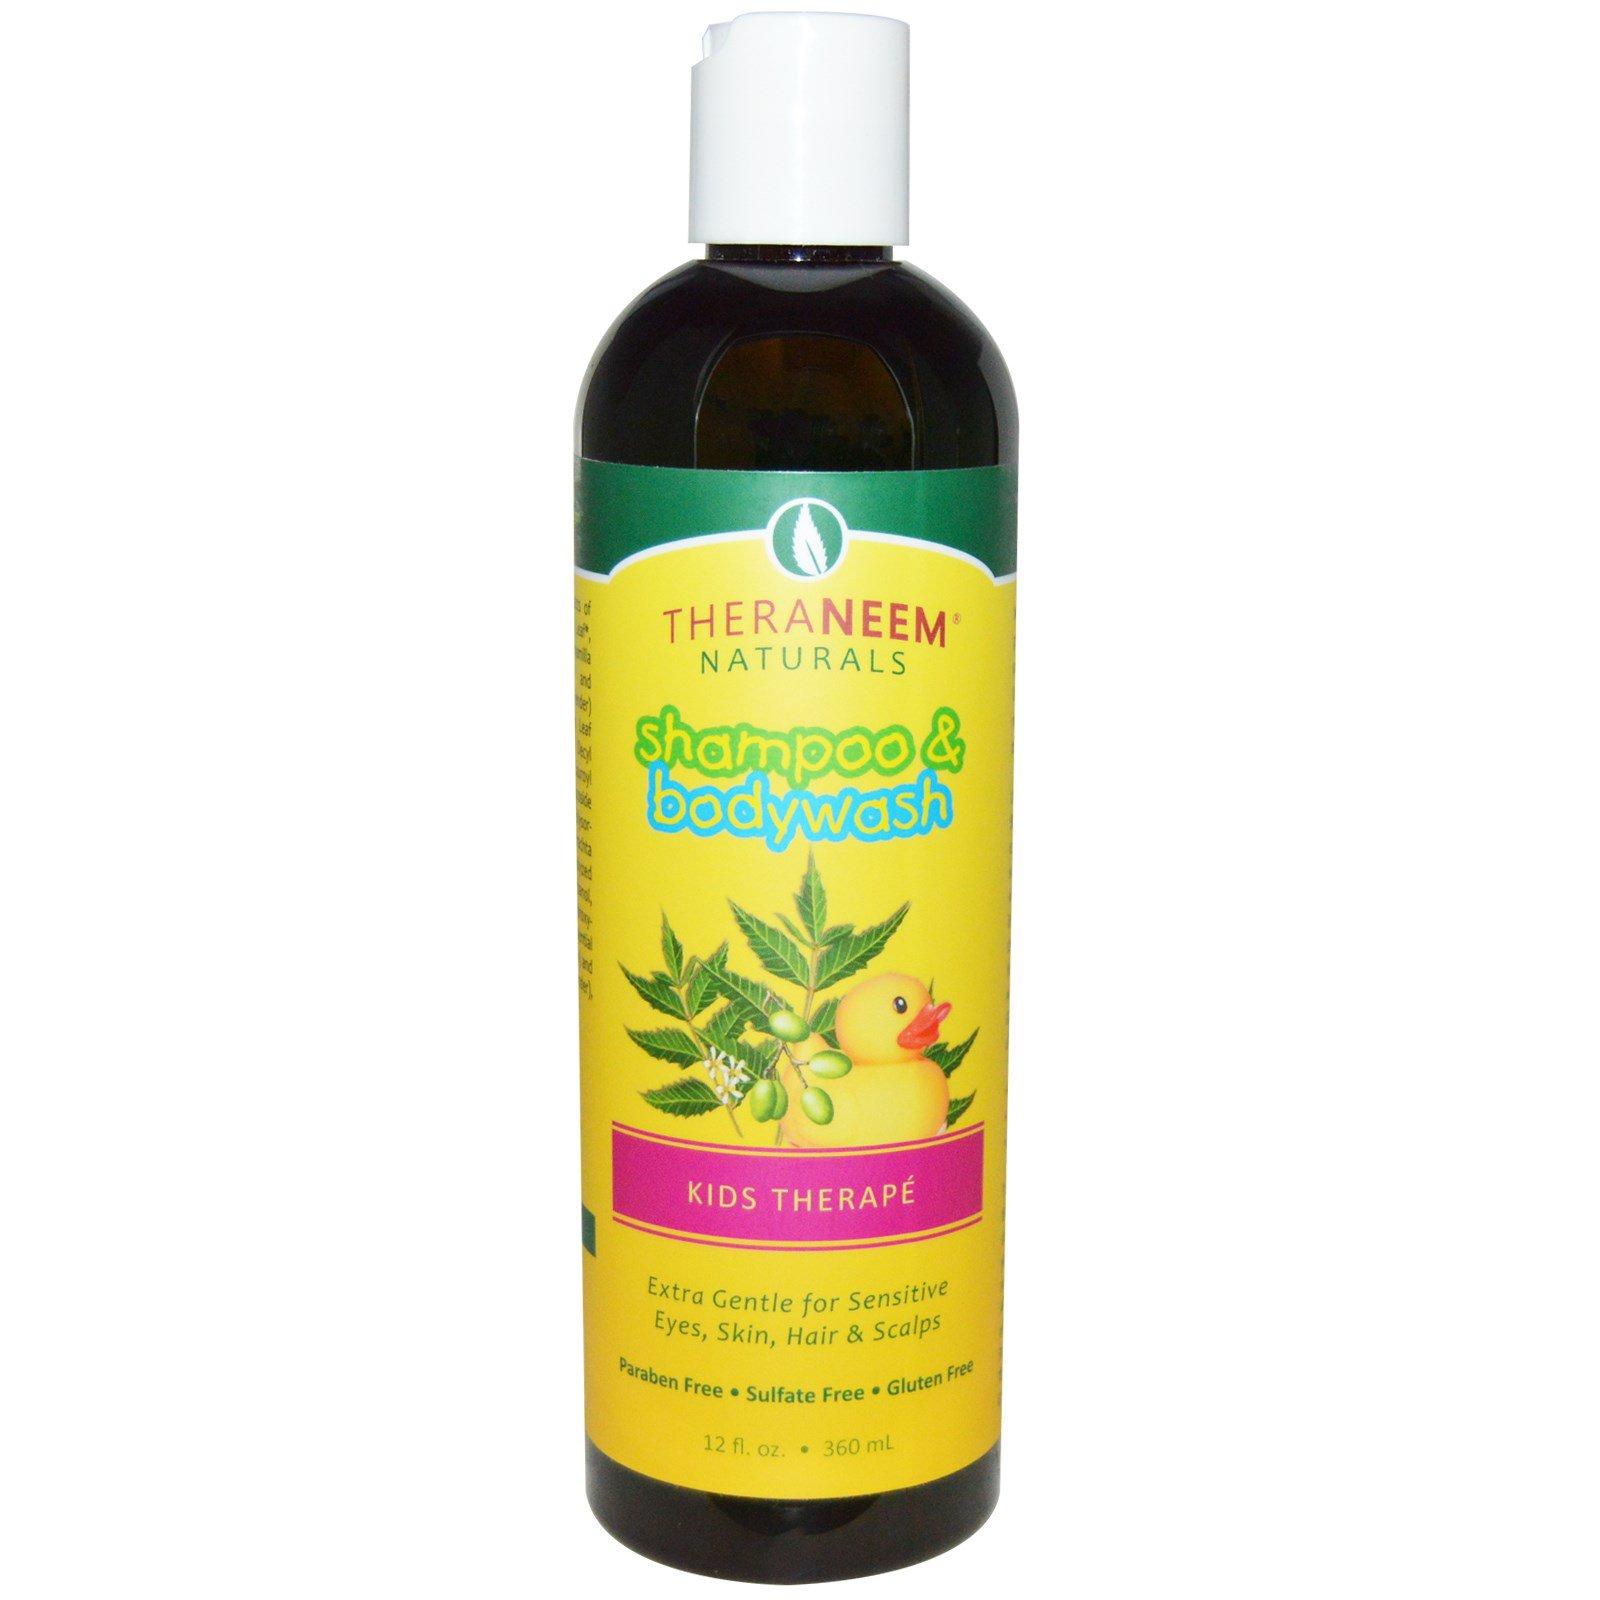 Organix South, TheraNeem, Shampoo & Bodywash, Kids Therapé, Neem & Chamomile, 12 fl oz (360 ml)